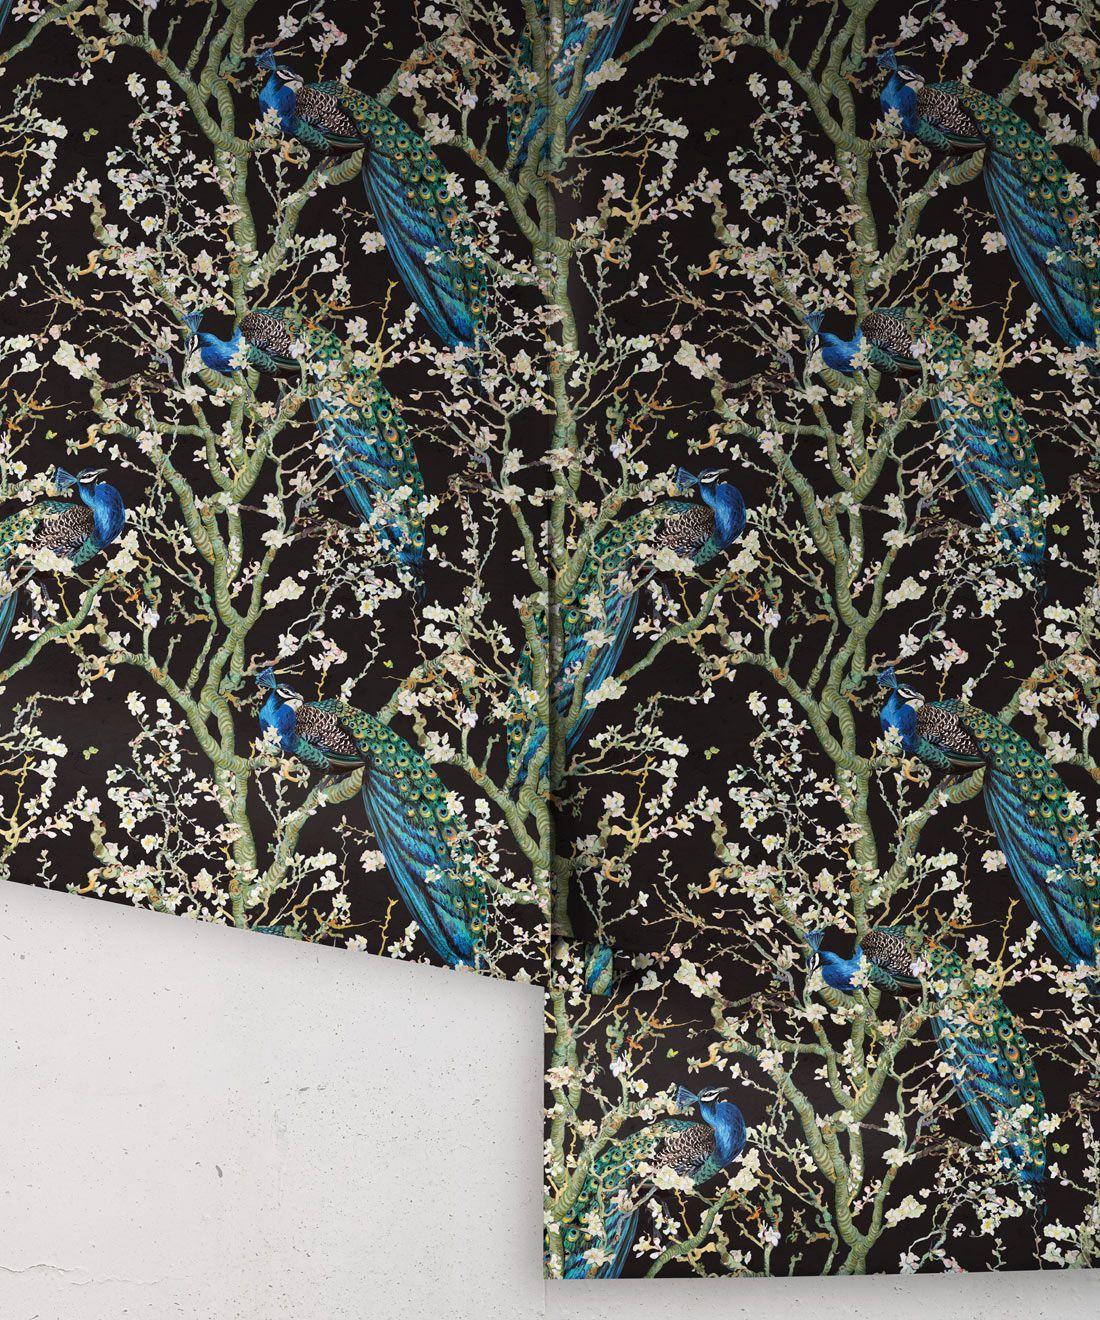 Almond Blossom Wallpaper • Chinoiserie Wallpaper • Wallpaper with Peacocks • Black Night Wallpaper •Rolls